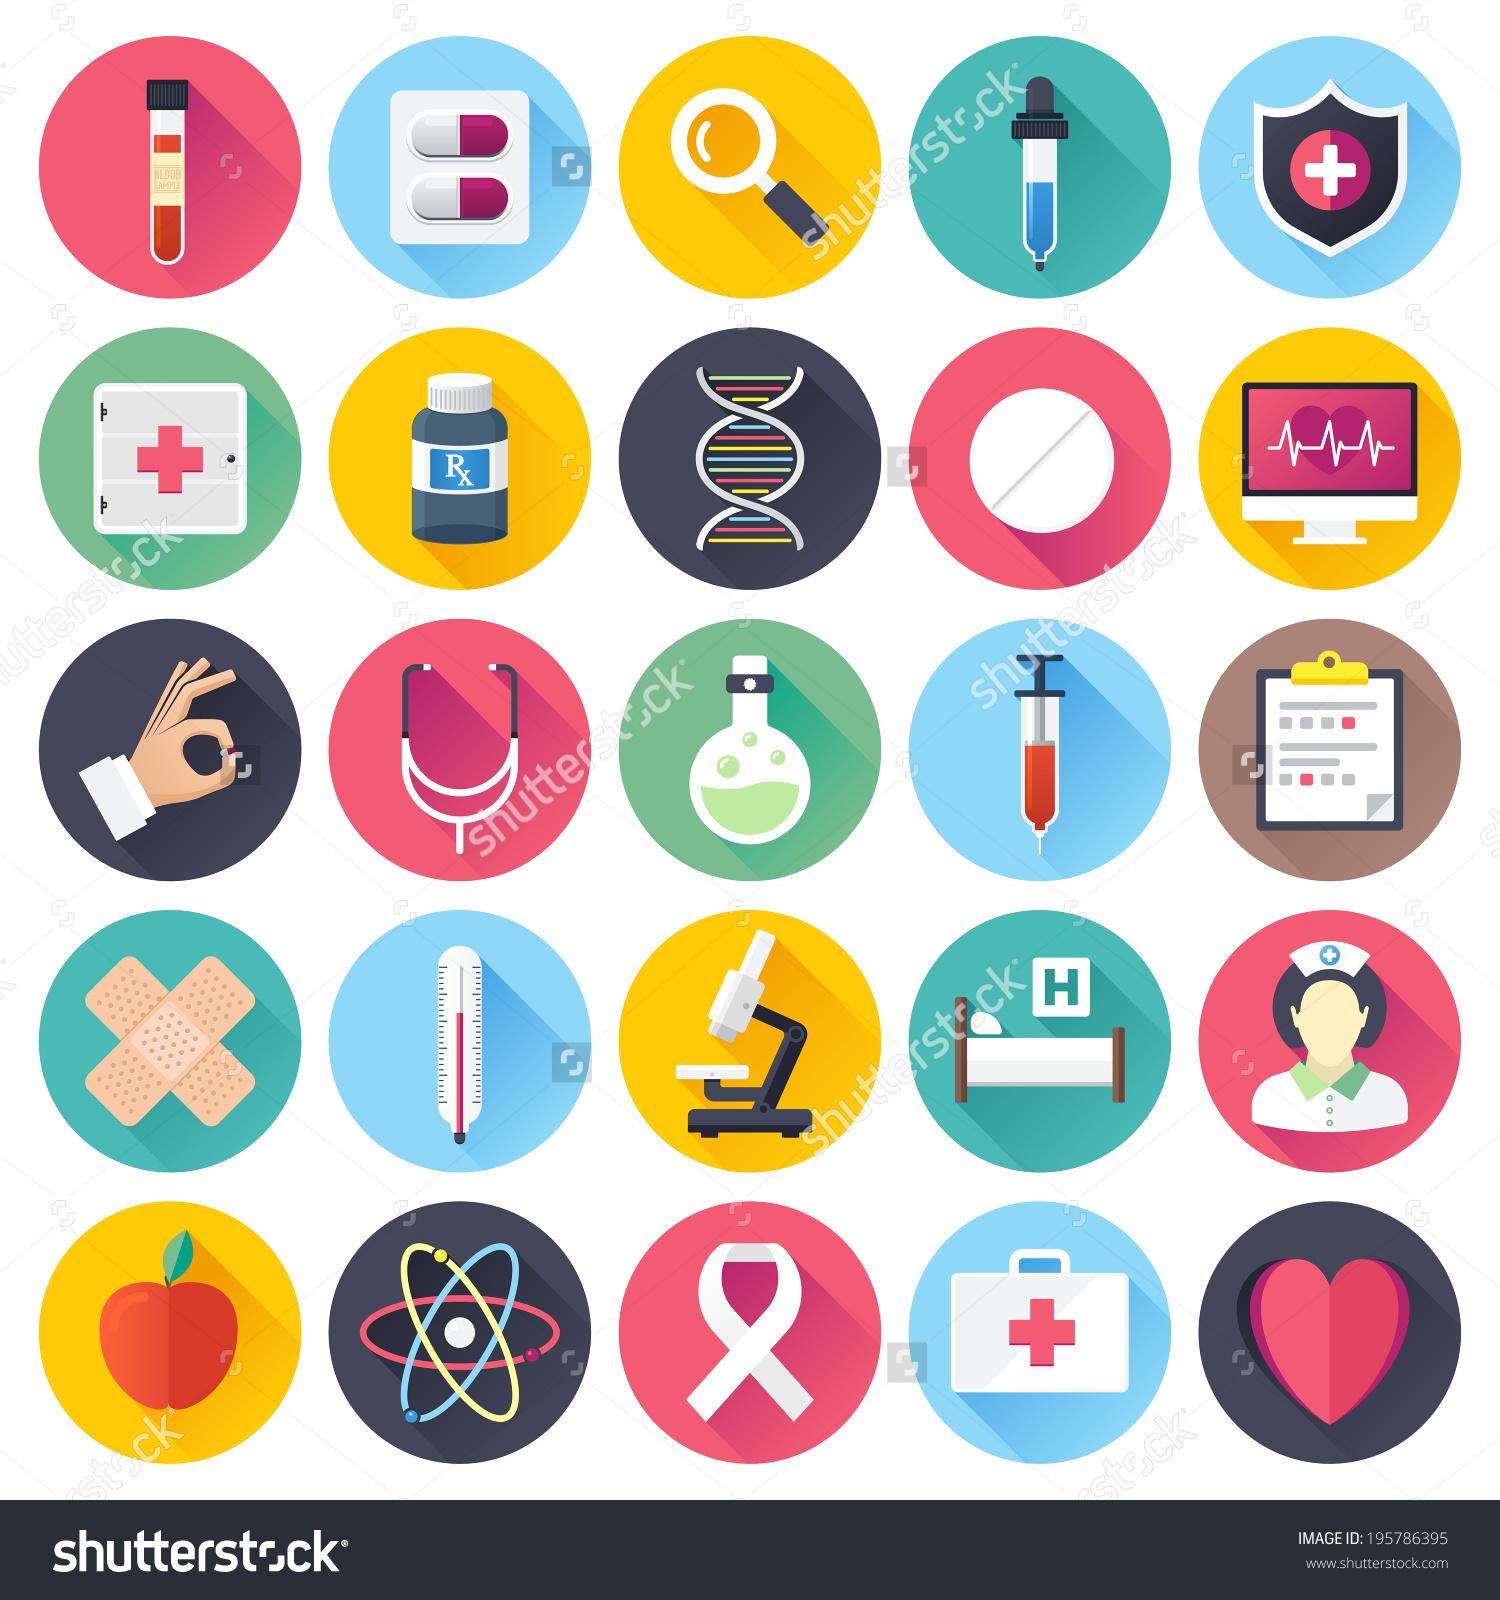 Medicine Clip Art Free | Clipart Panda - Free Clipart Images